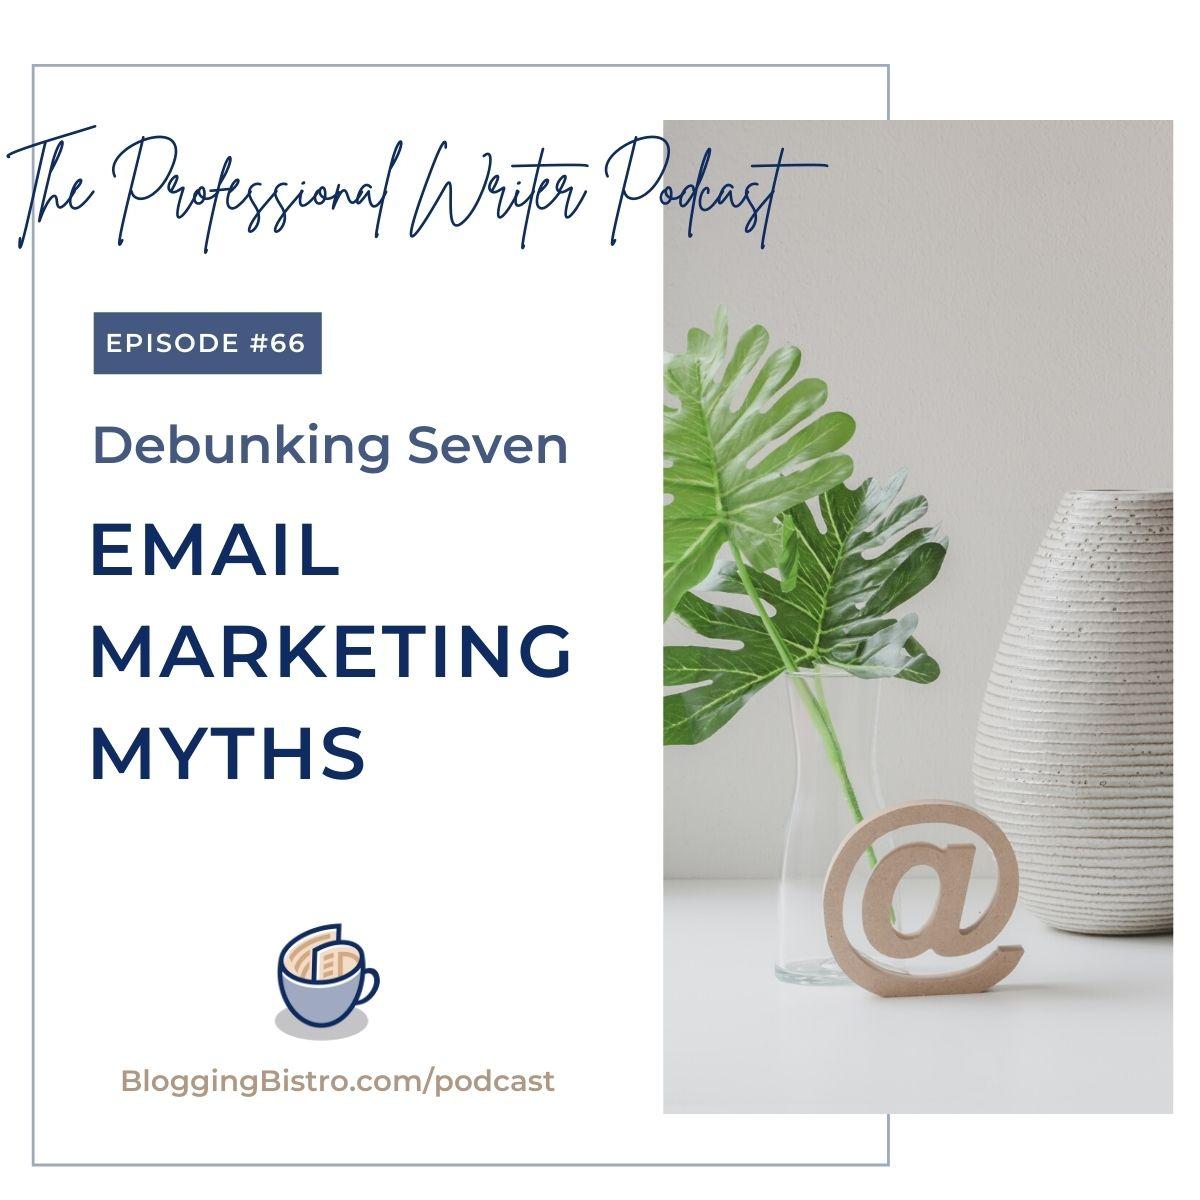 66 – Debunking 7 Email Marketing Myths